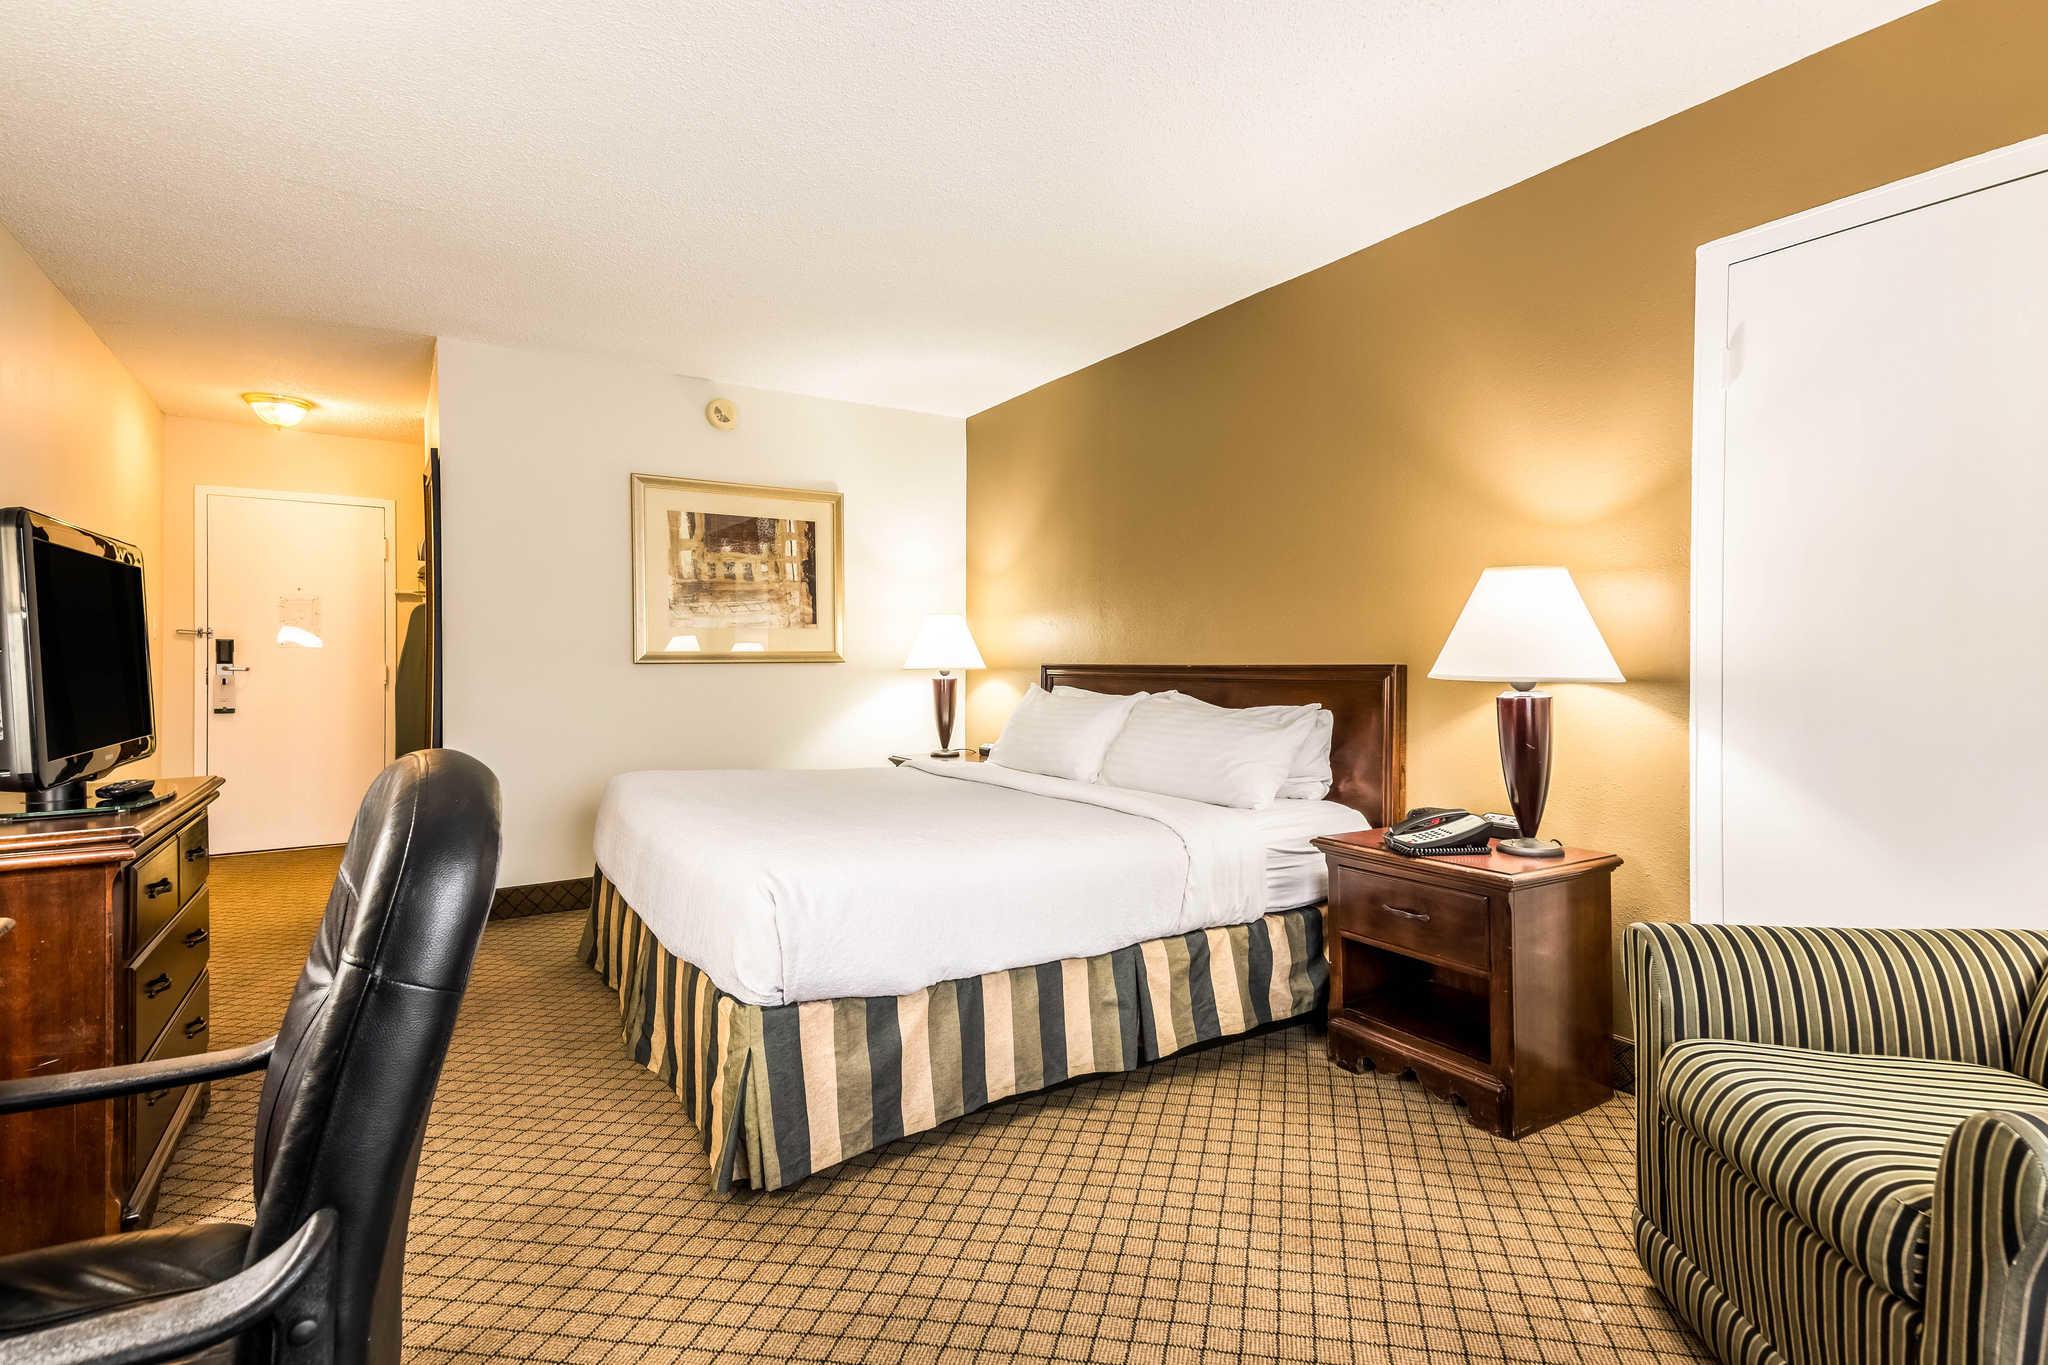 Quality Inn near Finger Lakes and Seneca Falls image 12